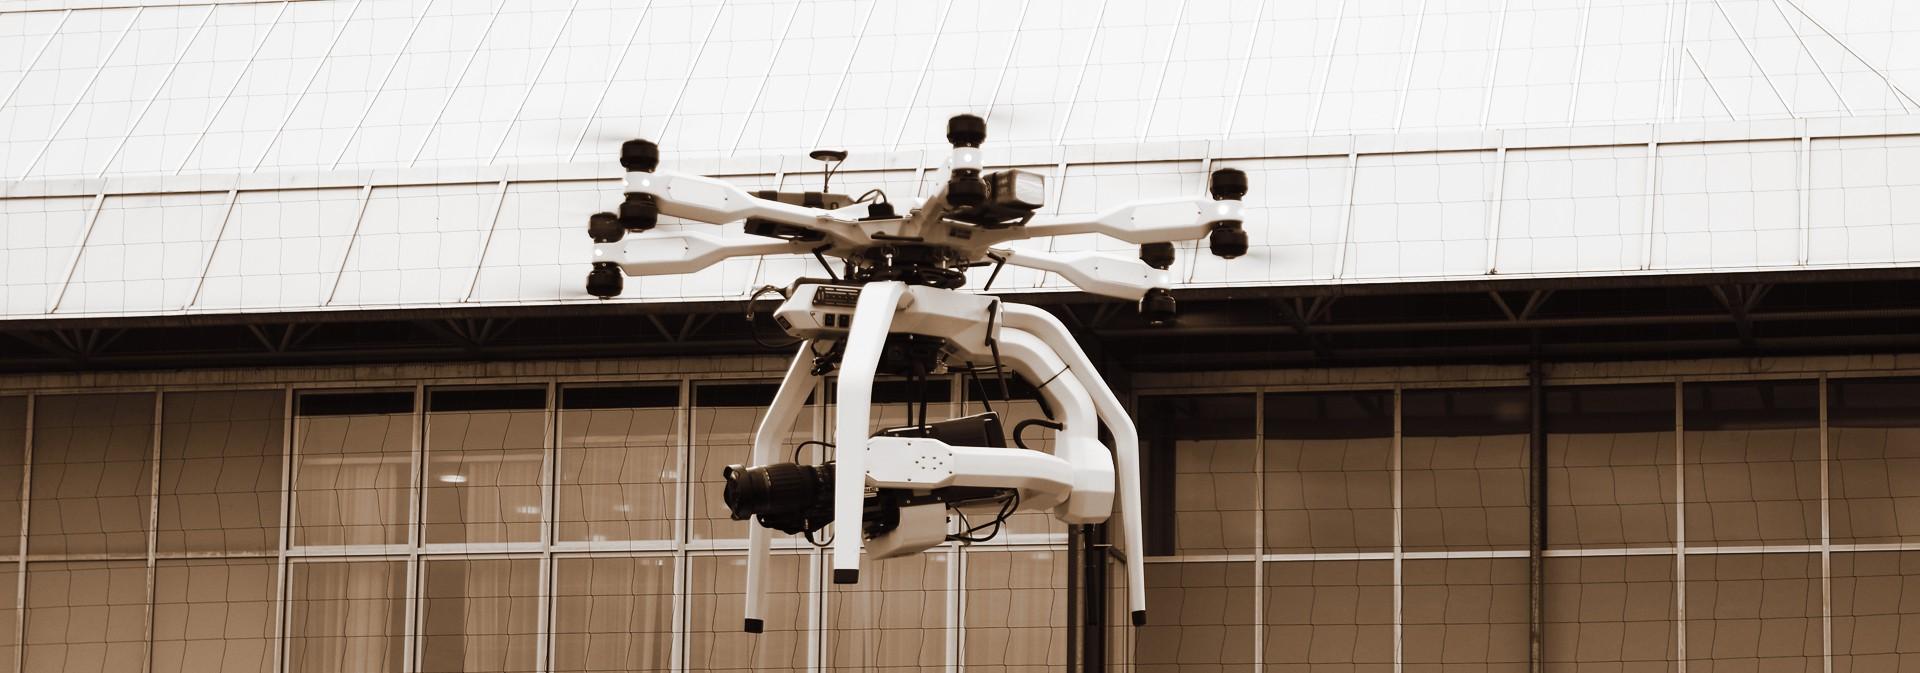 Kameradrohne, cameradrone